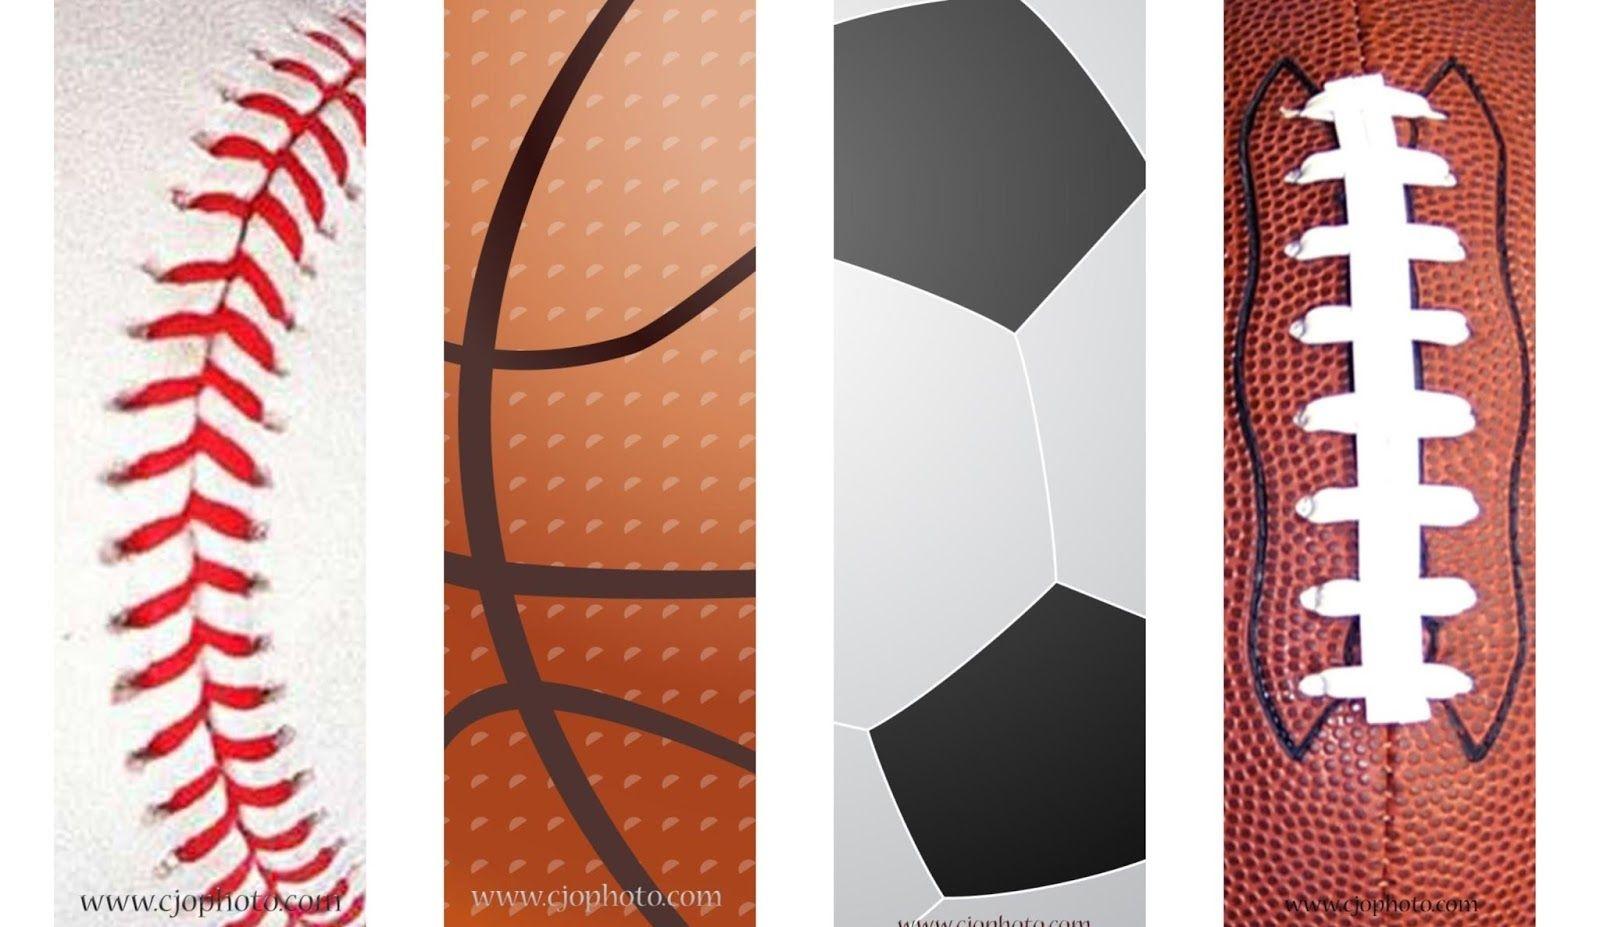 Printable Bookmarks: Sports | Free Printable Bookmarks | Bookmarks - Free Printable Sports Bookmarks